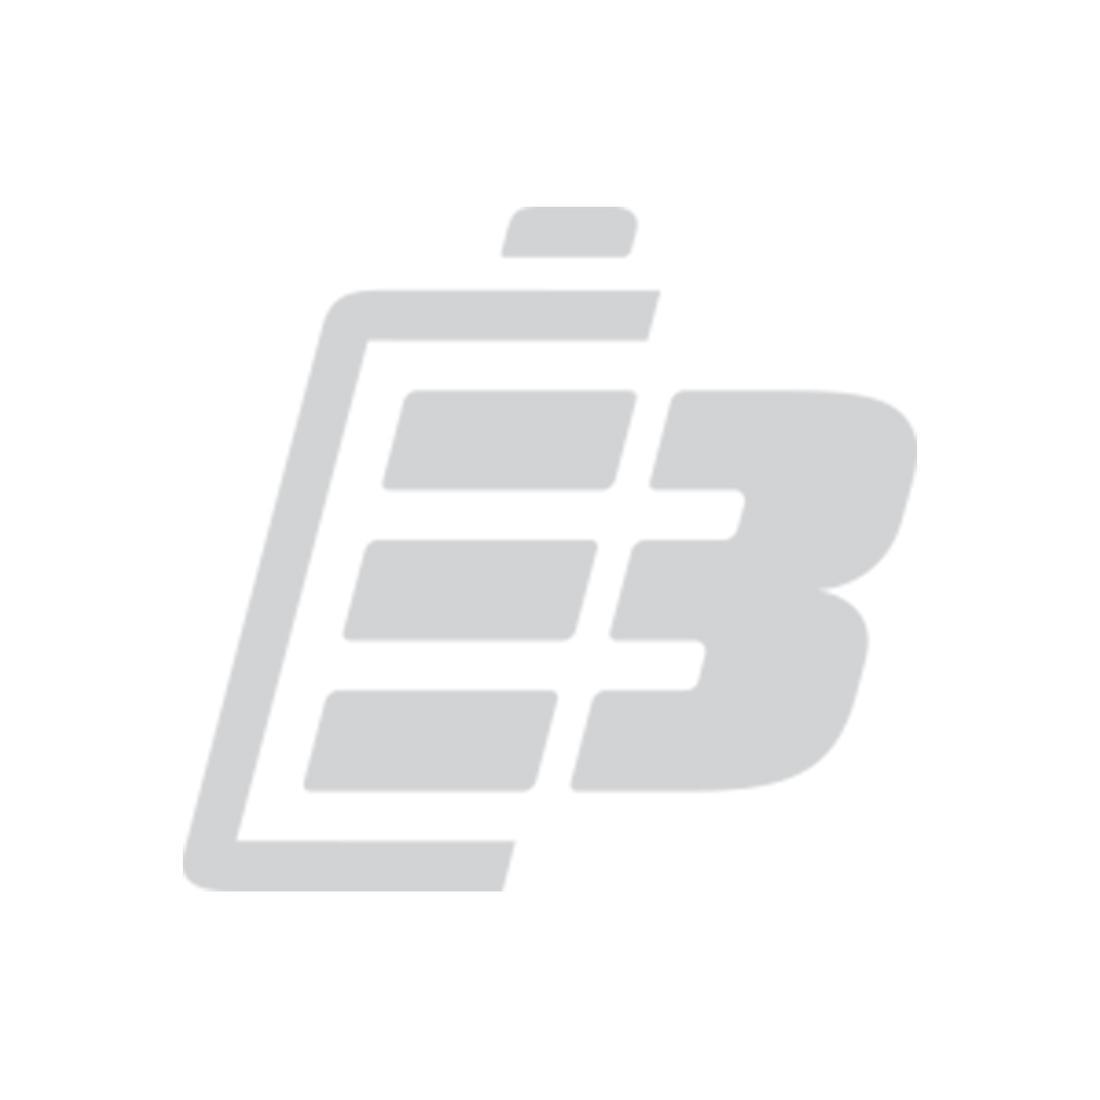 Power tool battery Dewalt 14.4V 2.0Ah_1